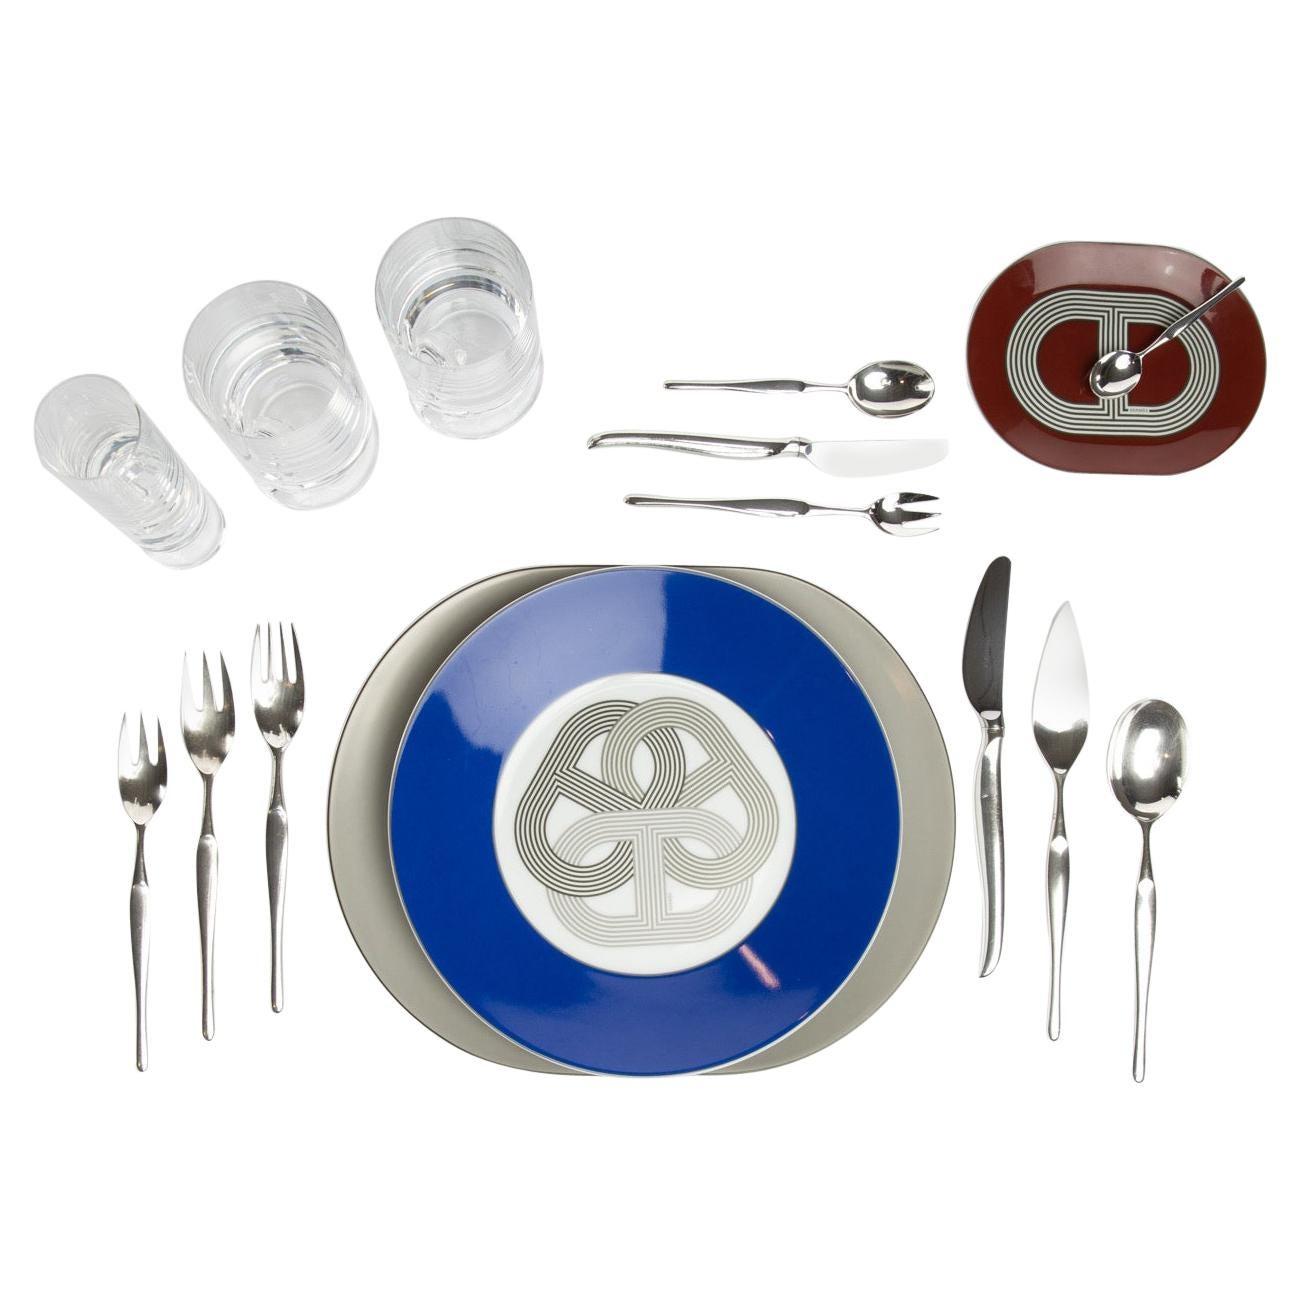 Duo, Silver-Plated Metal Flatware Set for 12 People, Tapio Wirkkala, Christofle